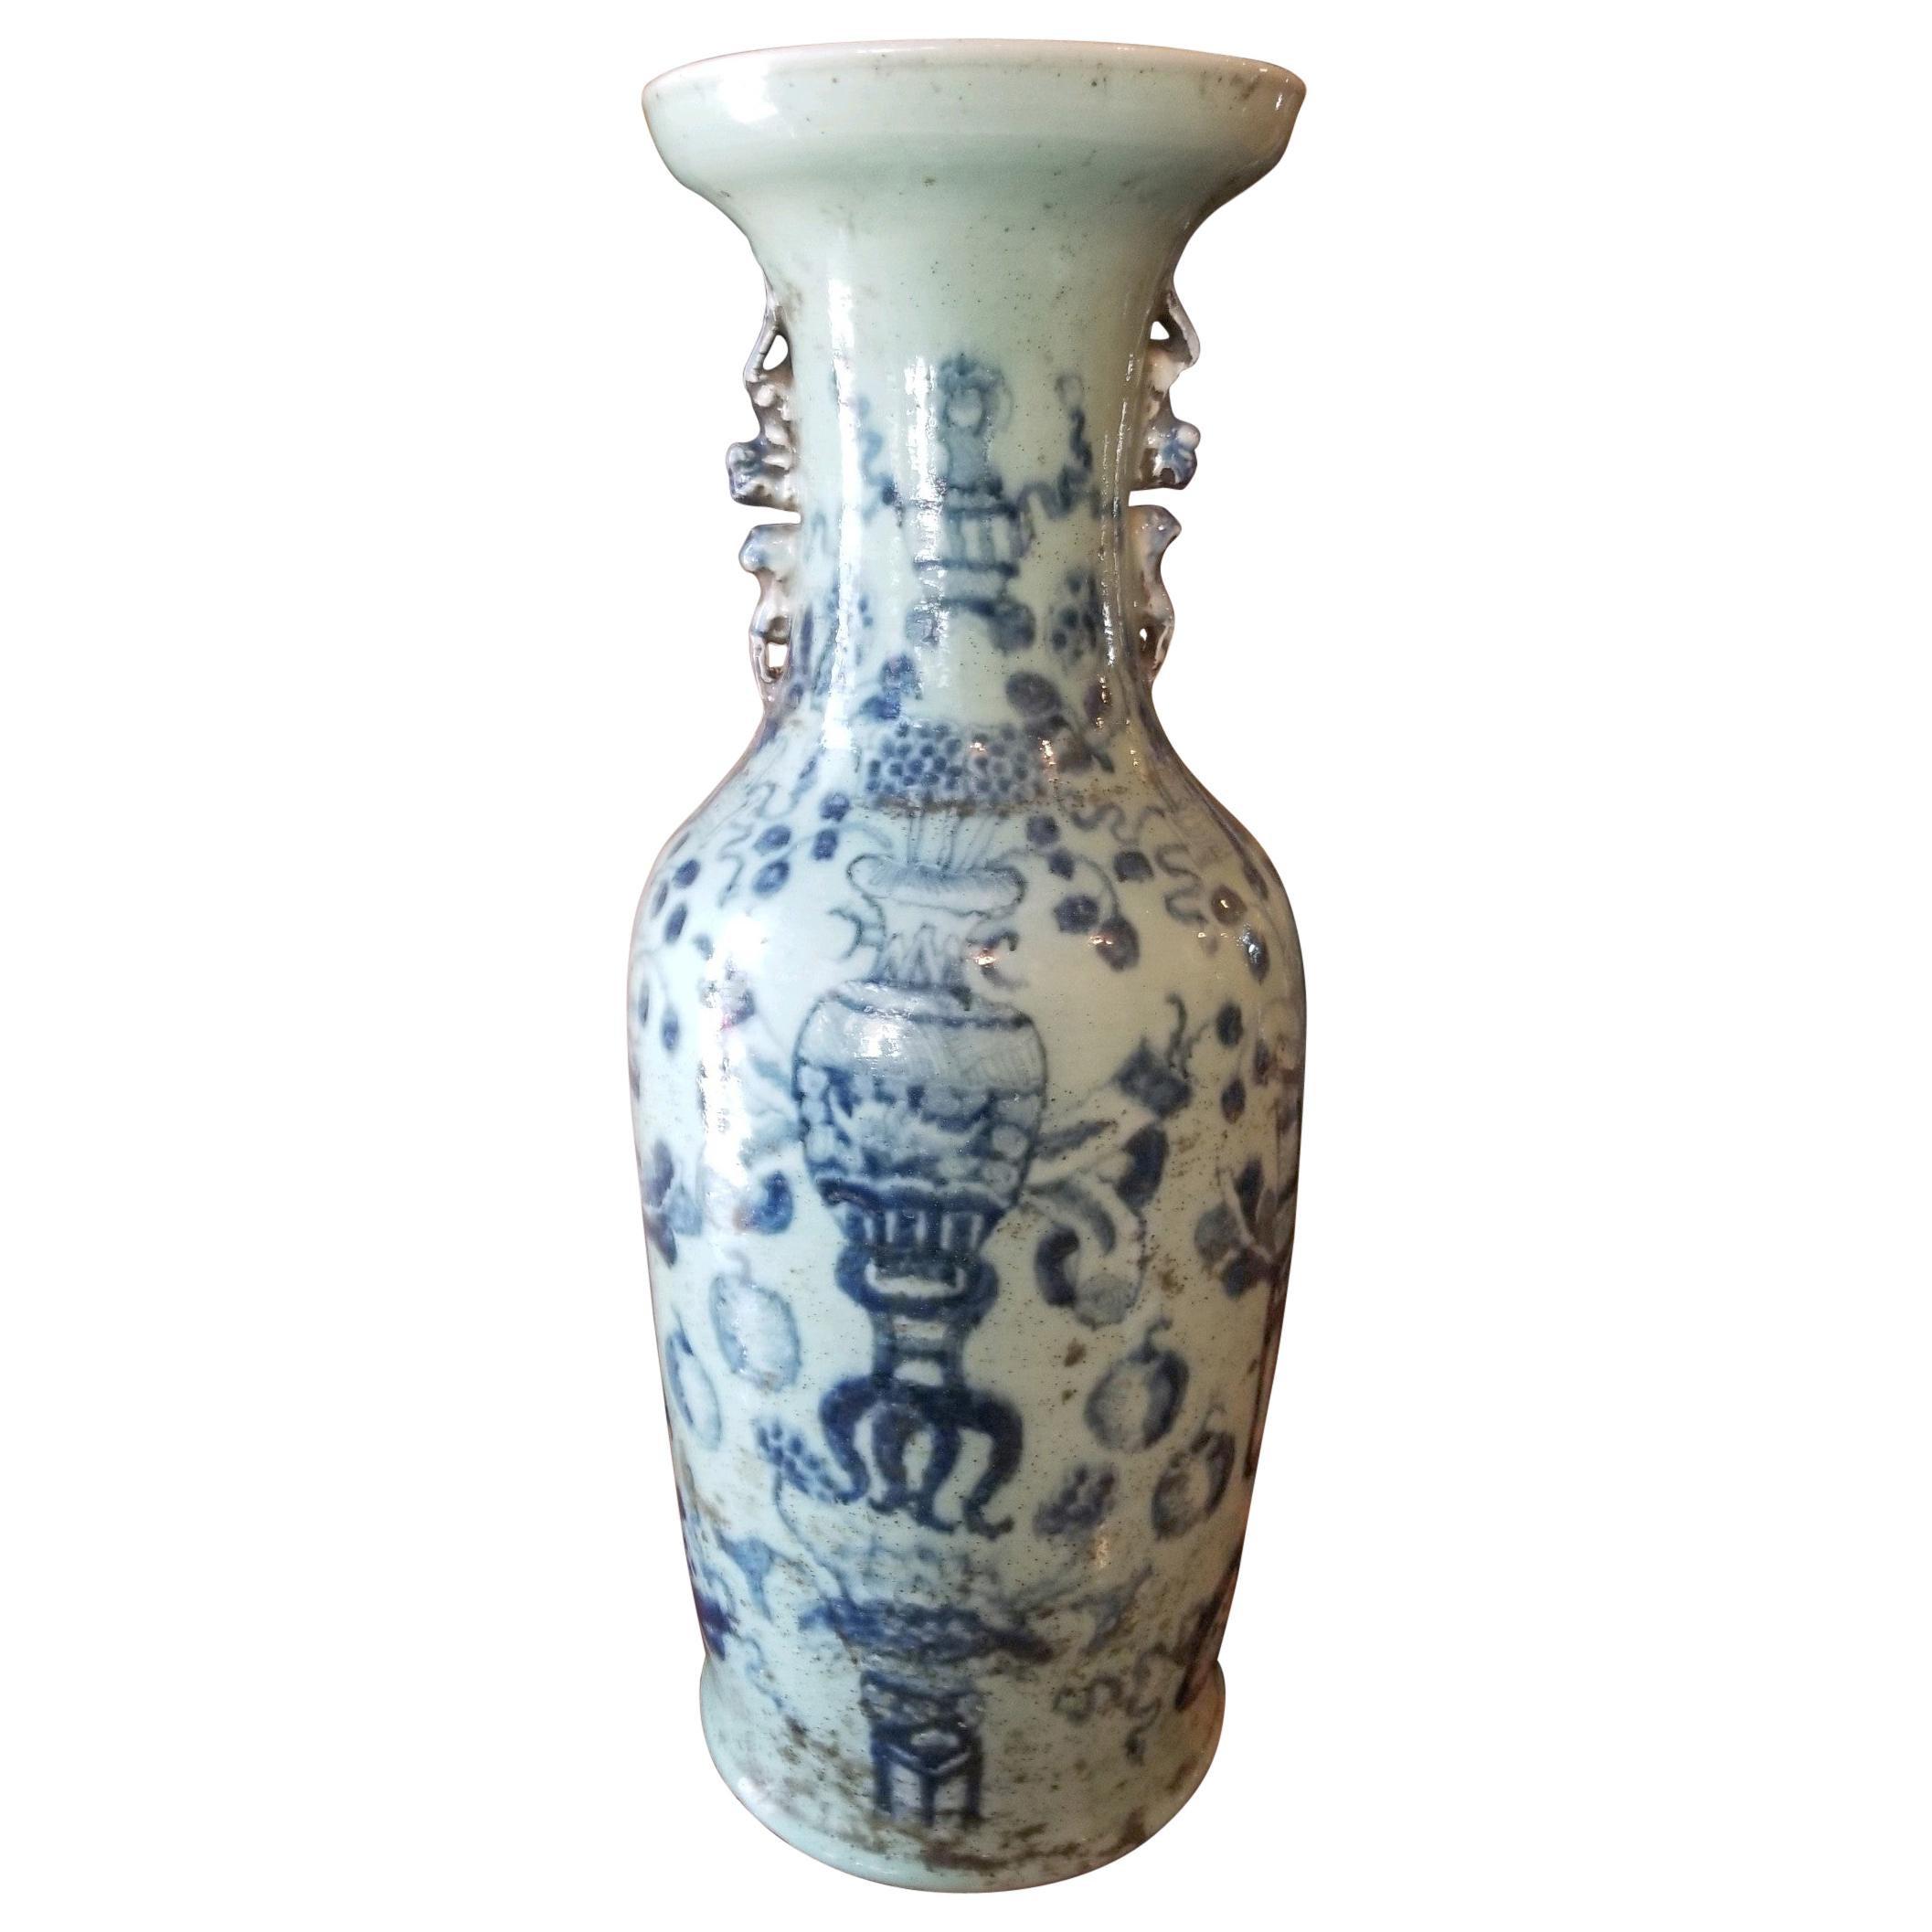 Classic Chinese Celadon Floor Vase, 19th Century